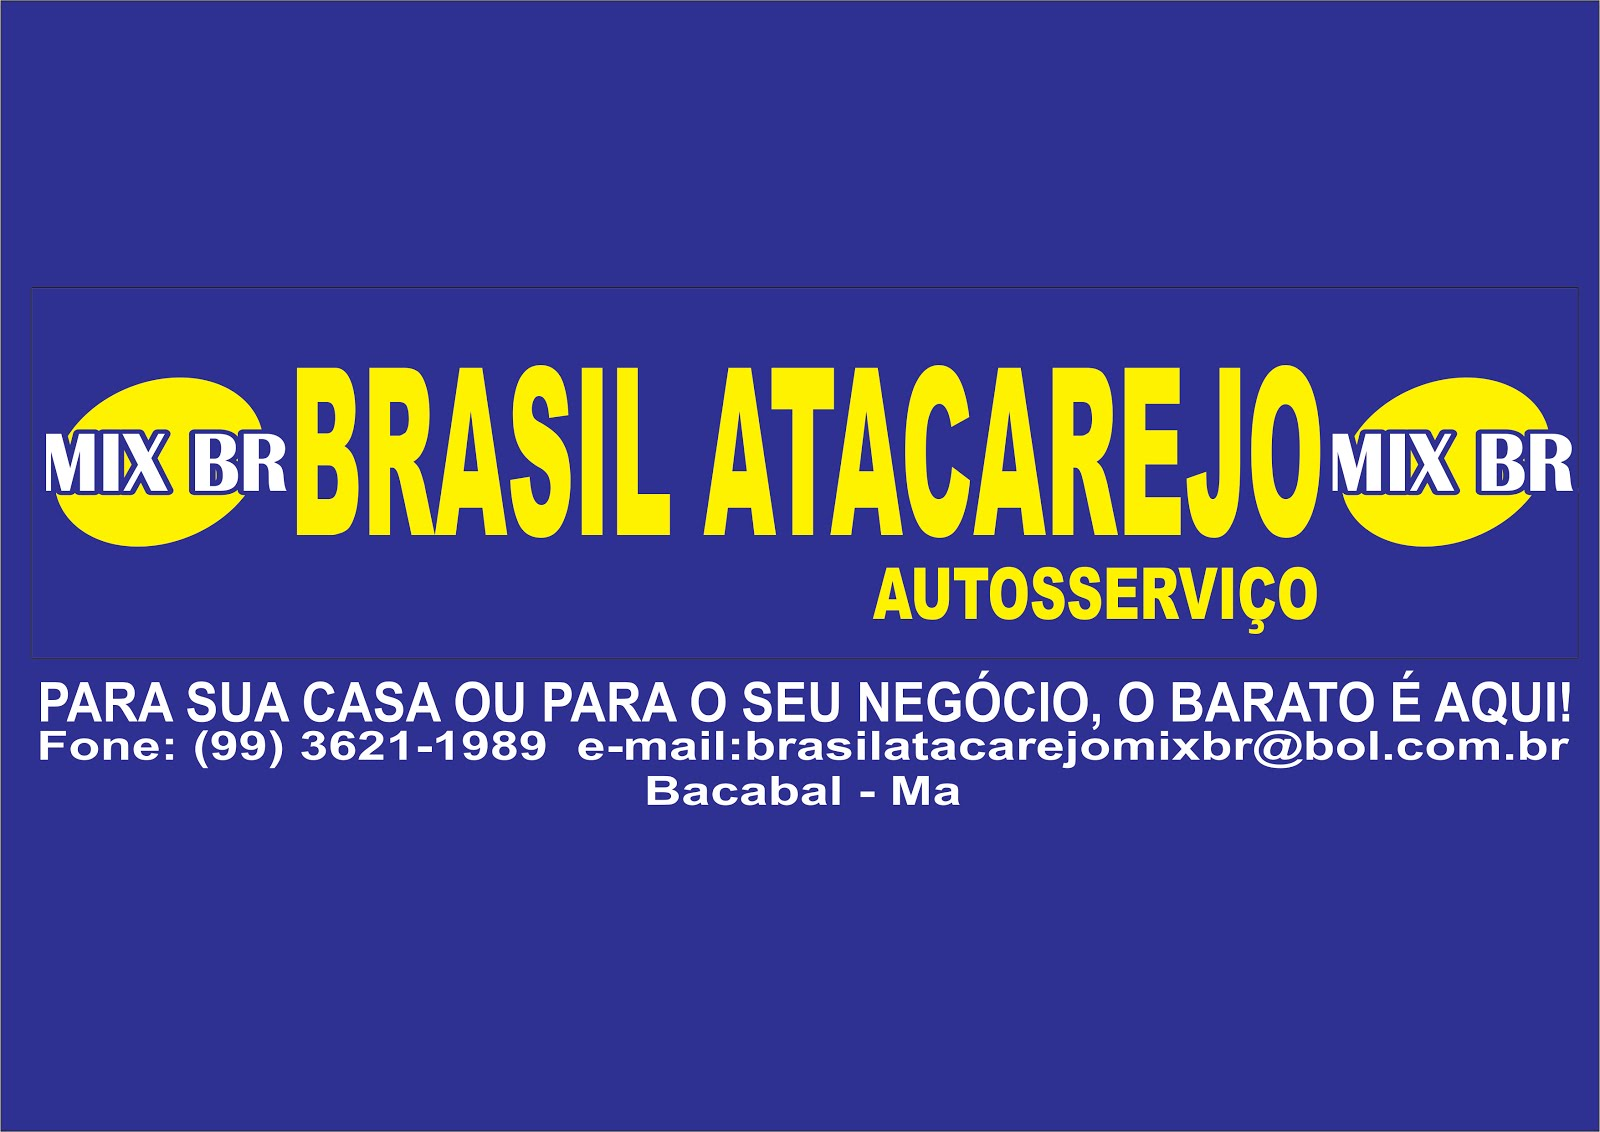 BRASIL ATACAREJO, O BARATO É AQUI